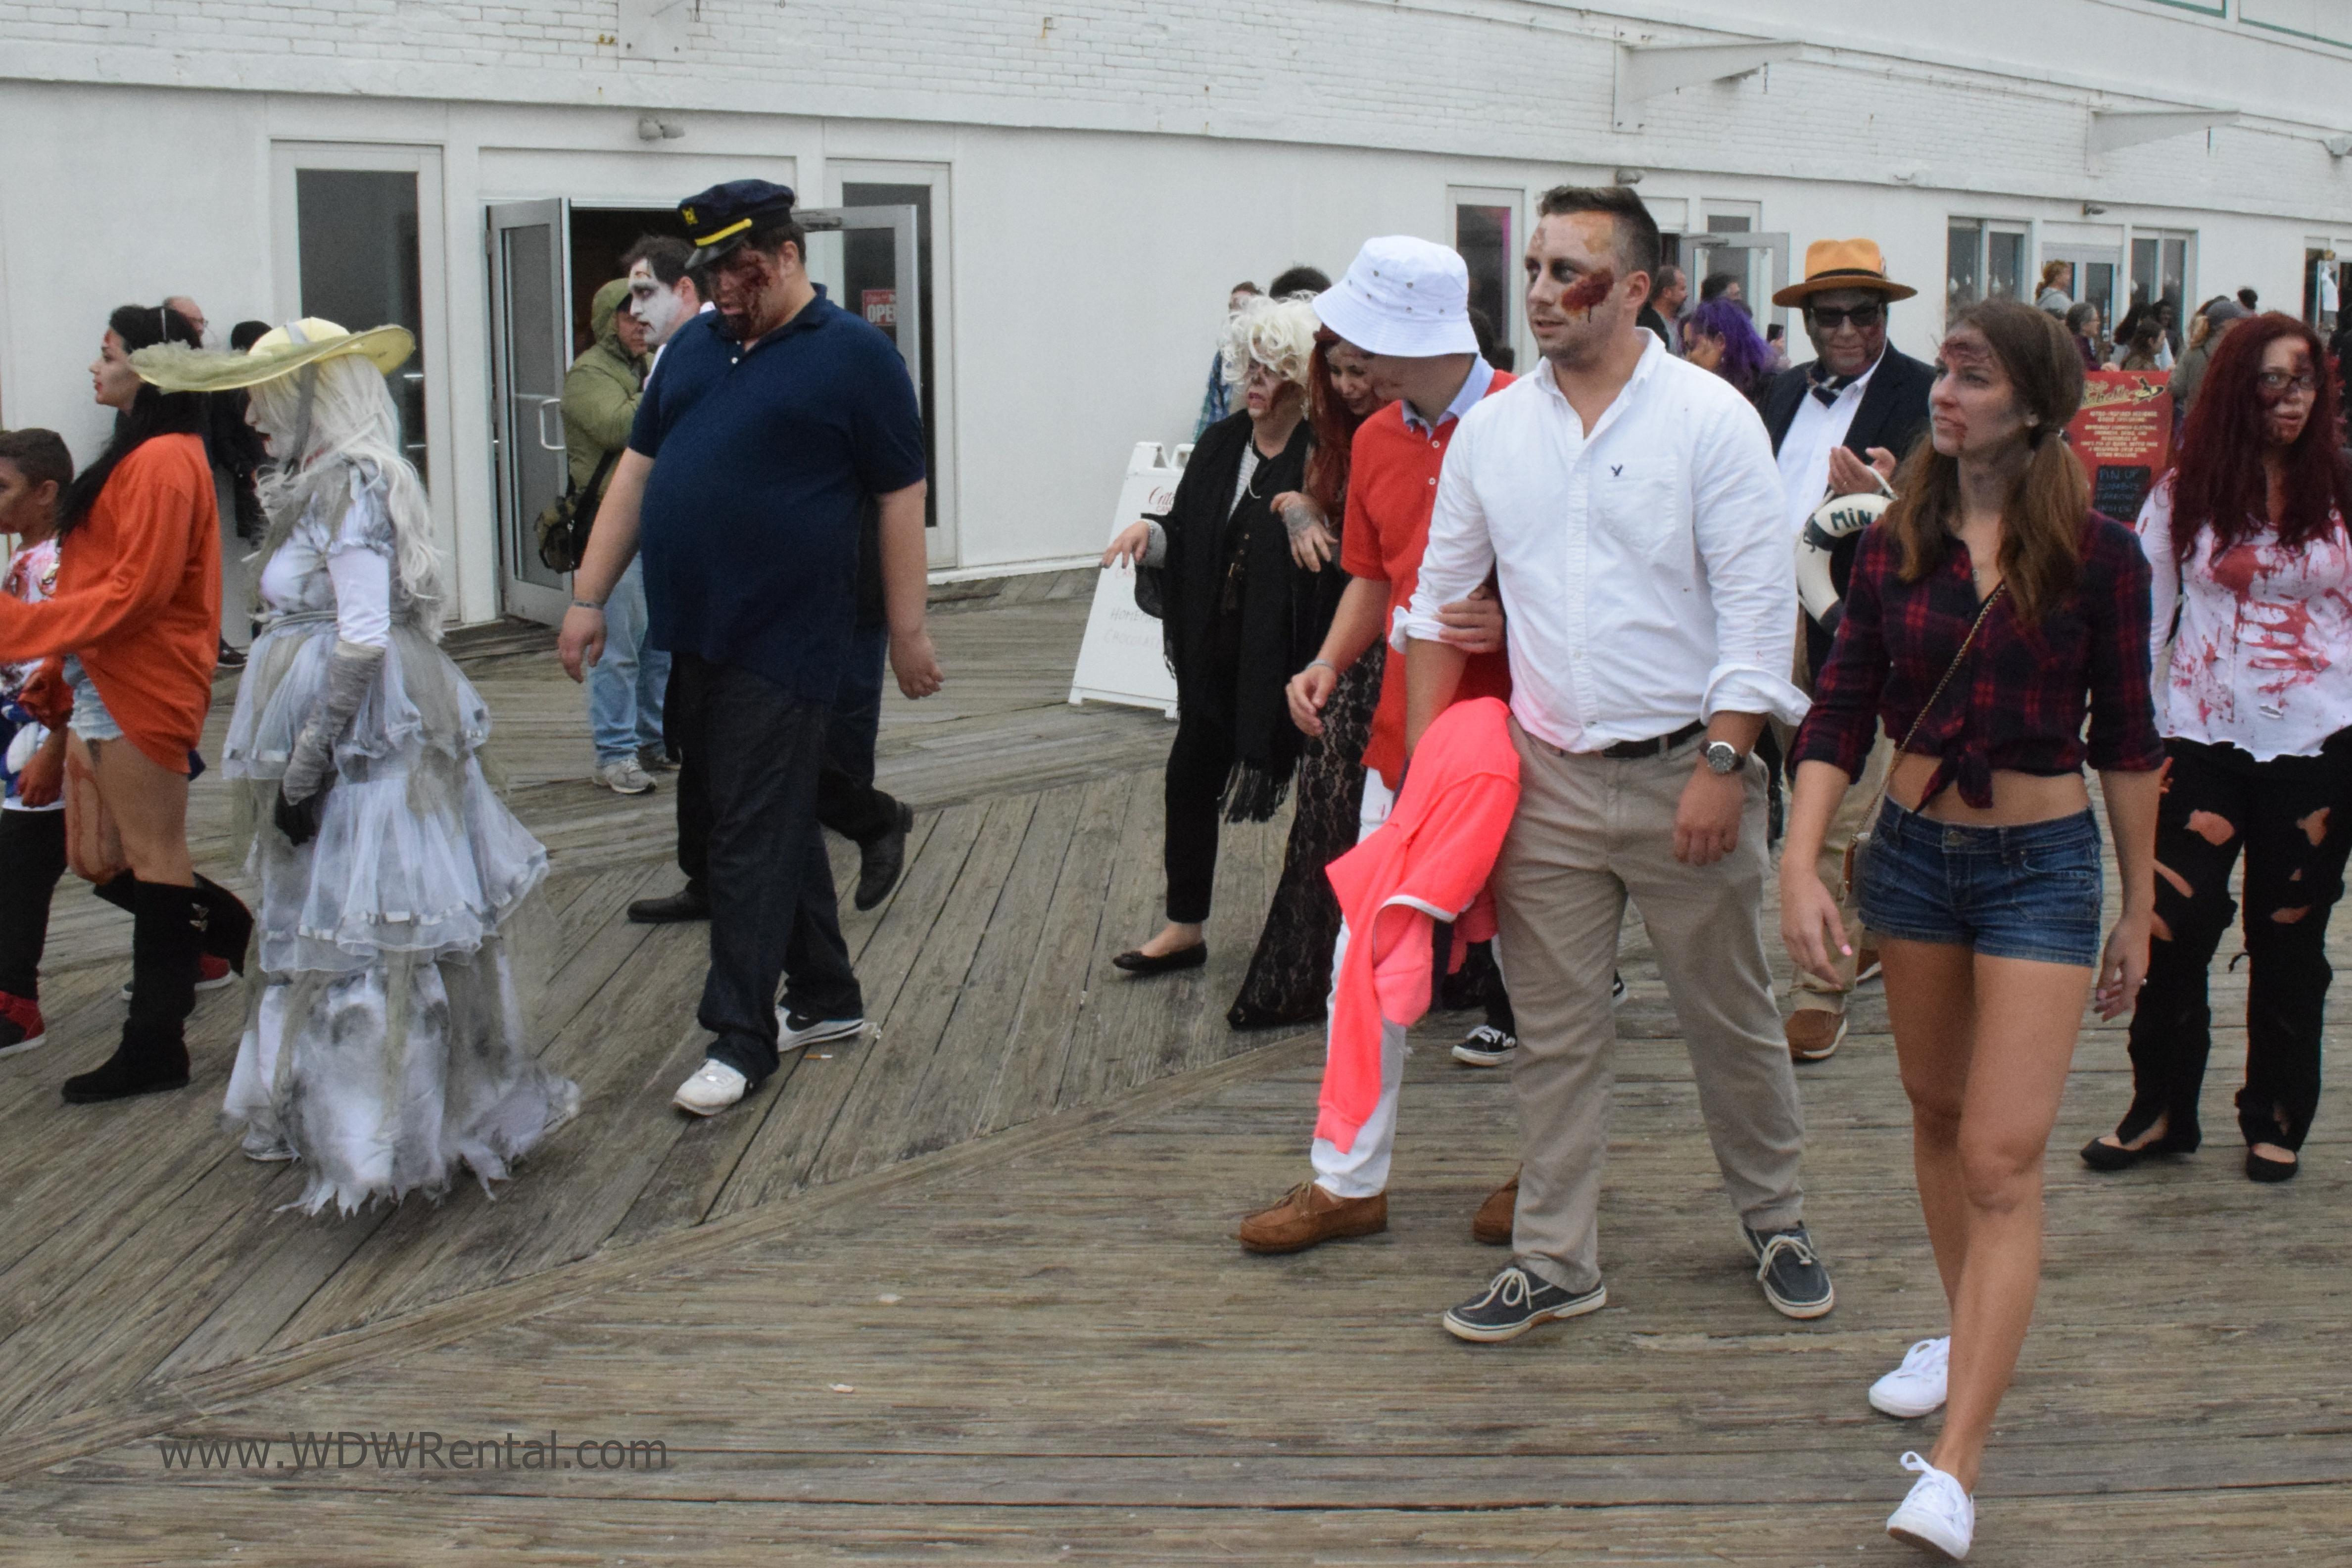 Gilligans Island Zombies - Zombie Skipper - Zombie Gilligan ...